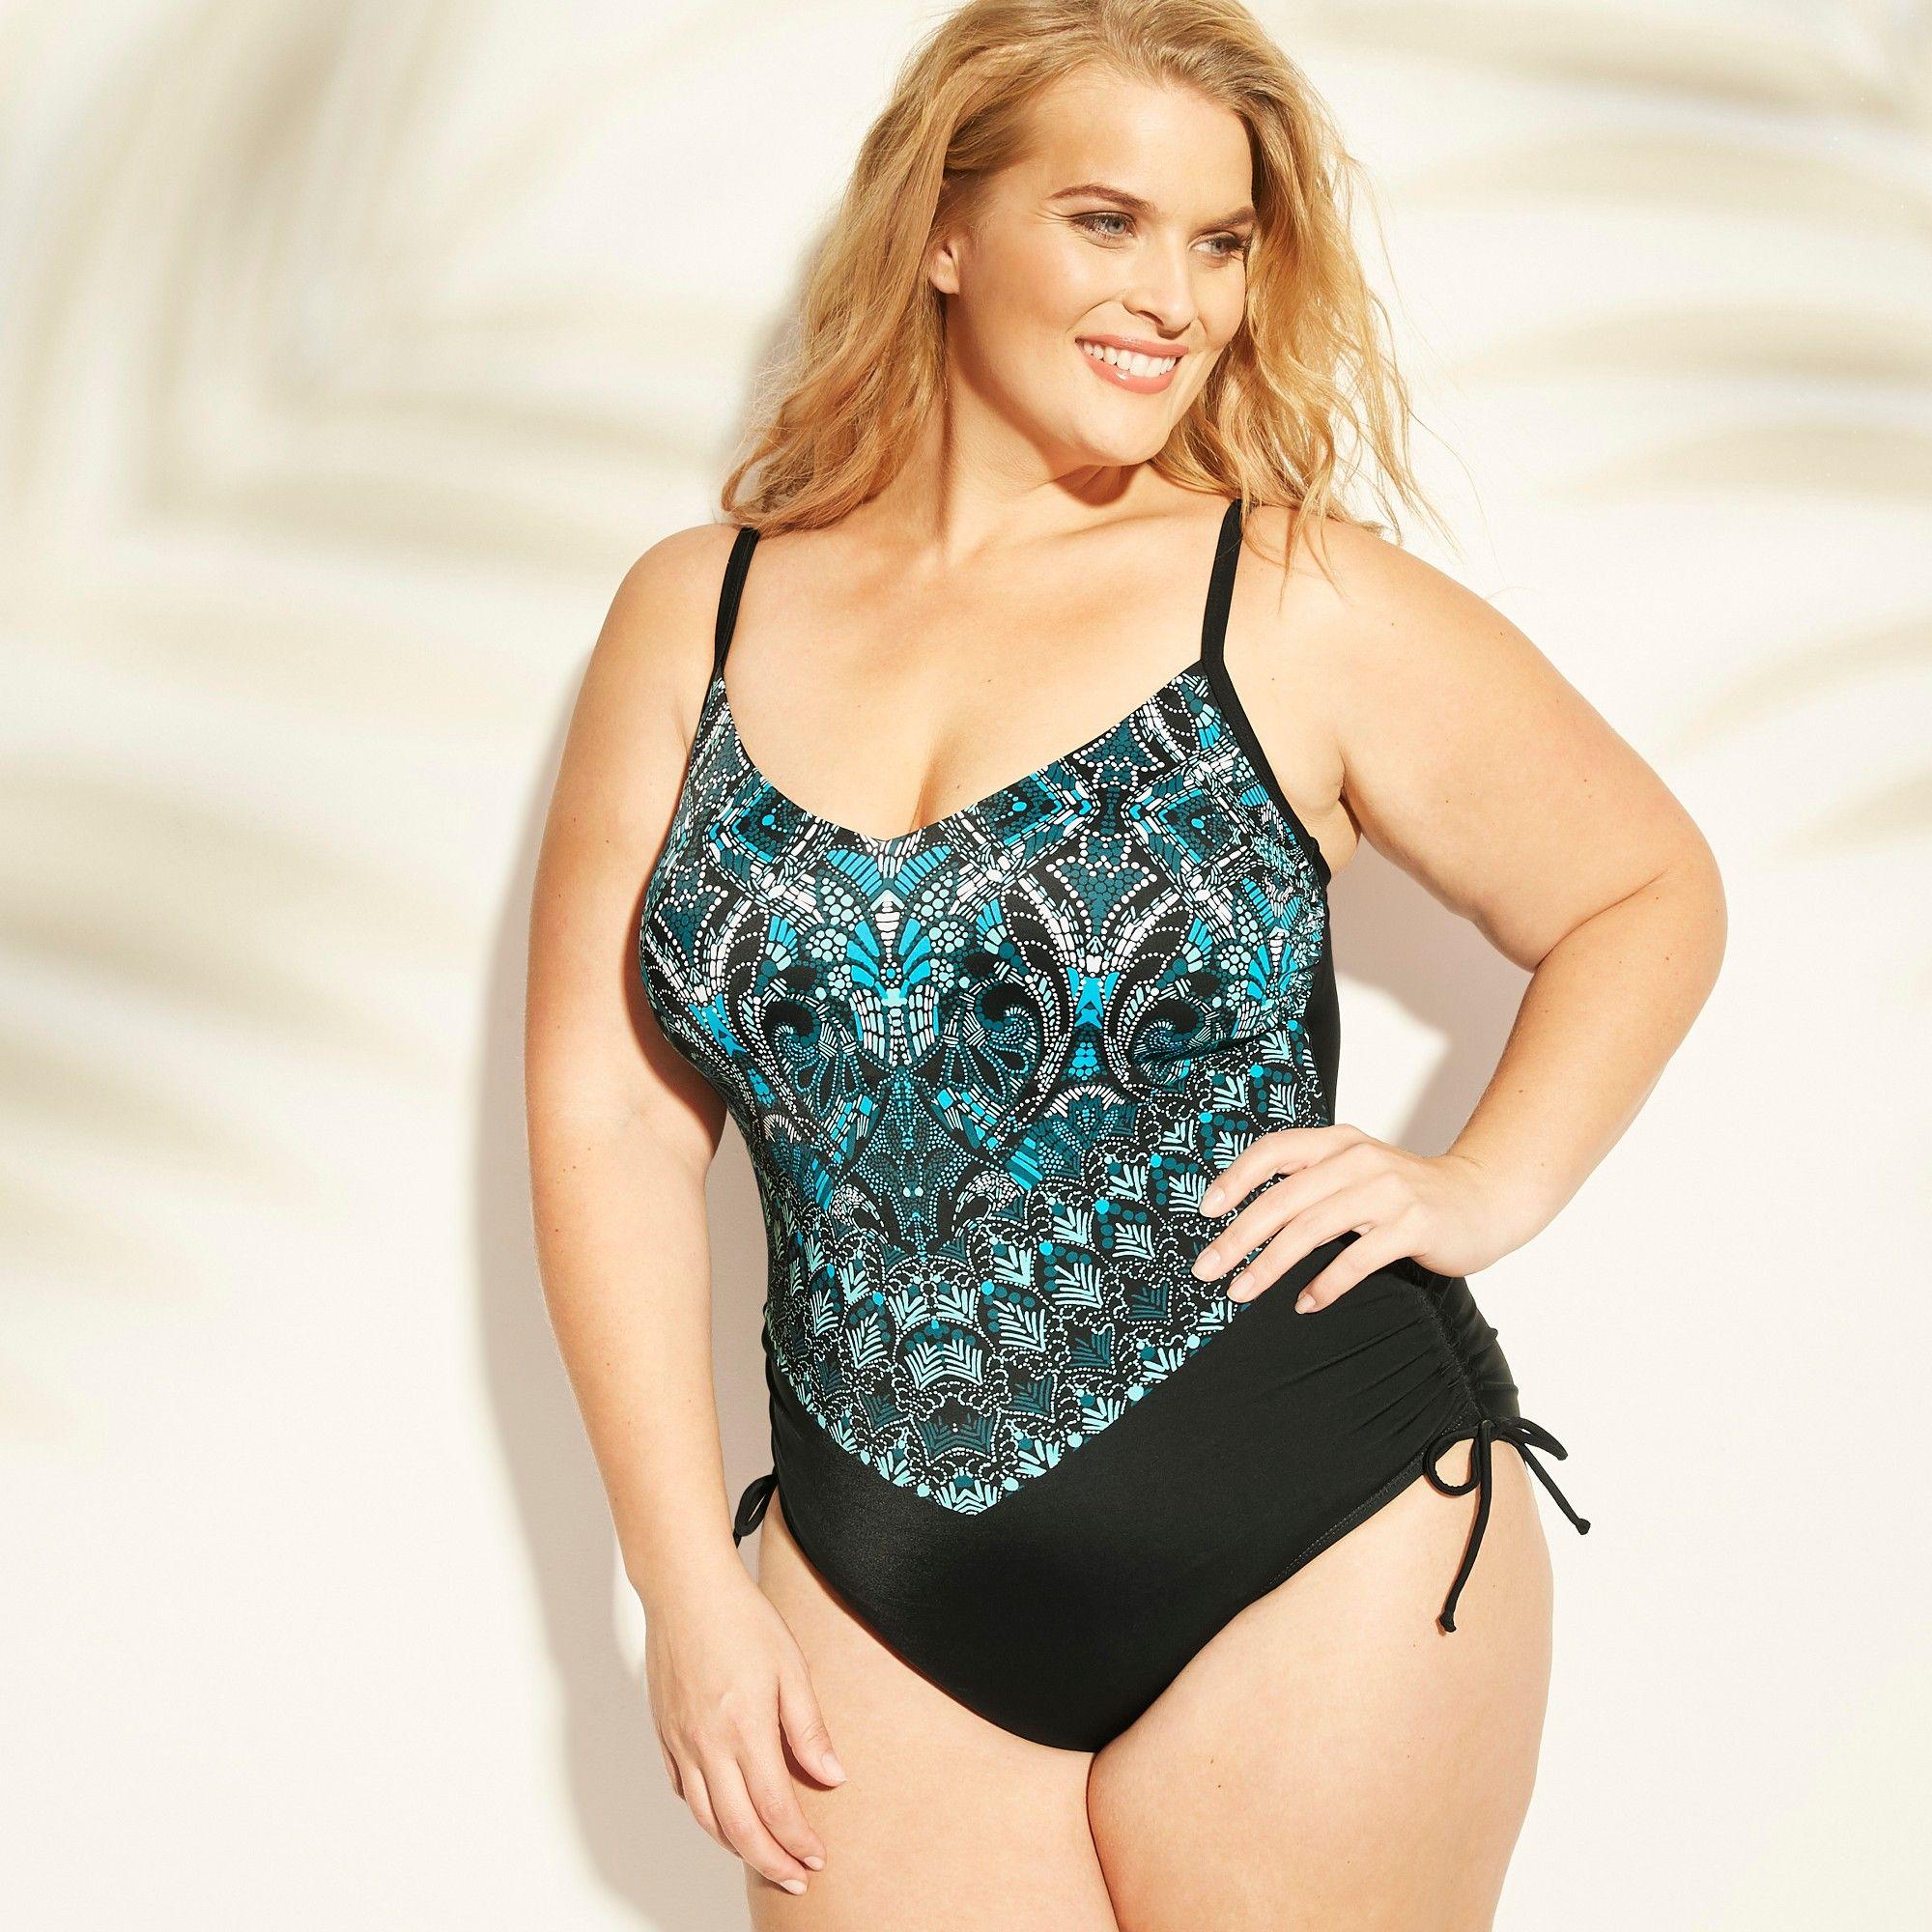 d71543e7ffc47 Women's Plus Size Halter Side Cinch One Piece Swimsuit - Aqua Green Blue  Print 26W